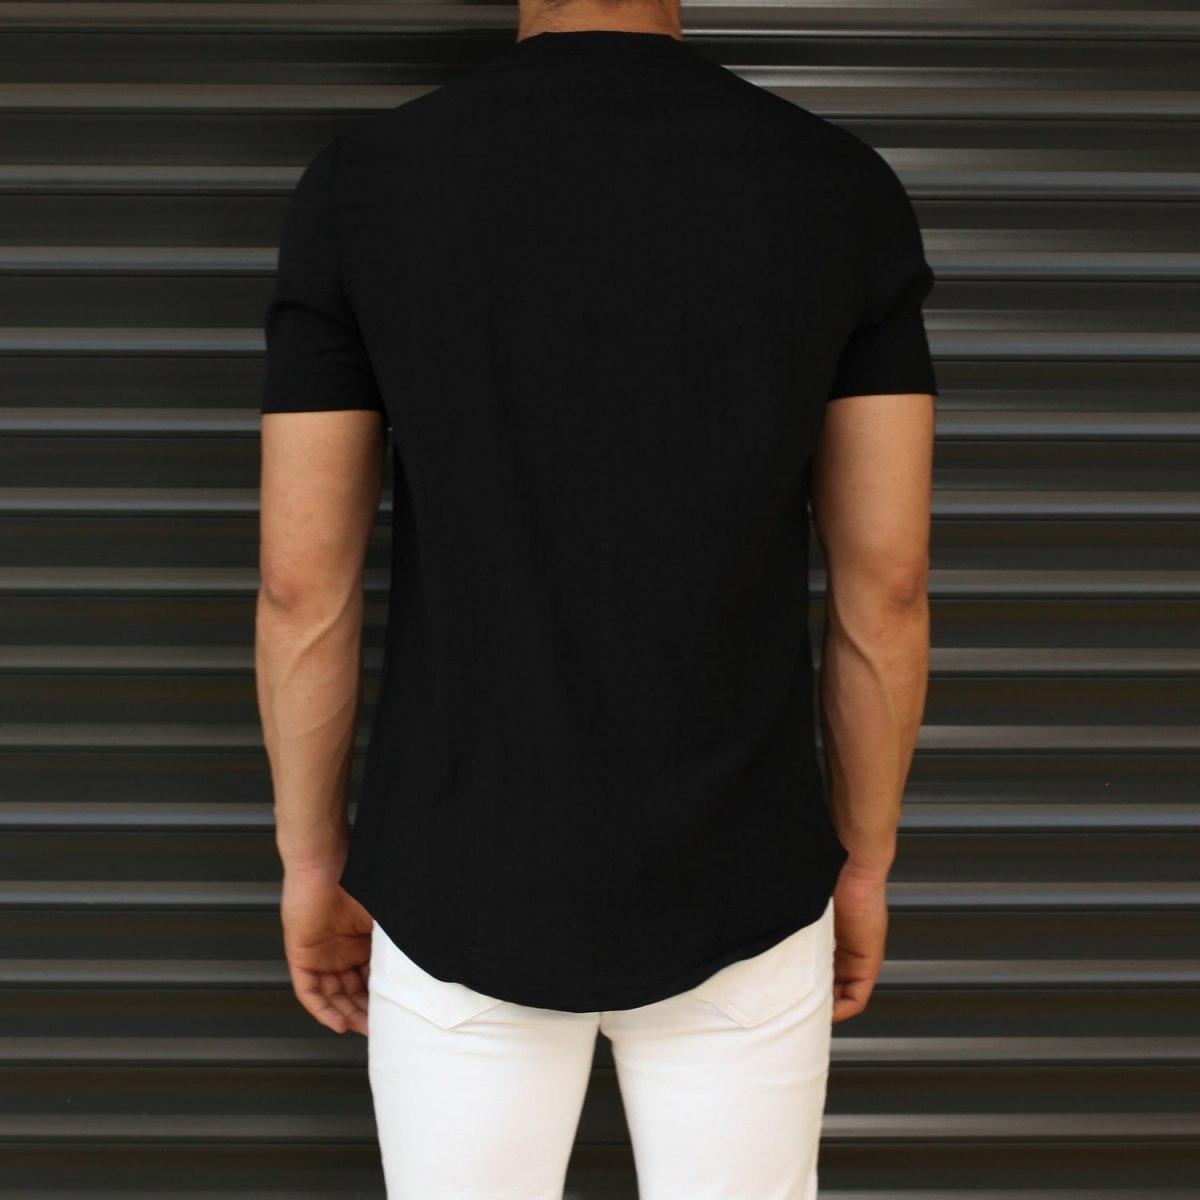 Men's Short Sleeve Grandad Collar Shirt In Black Mv Premium Brand - 3